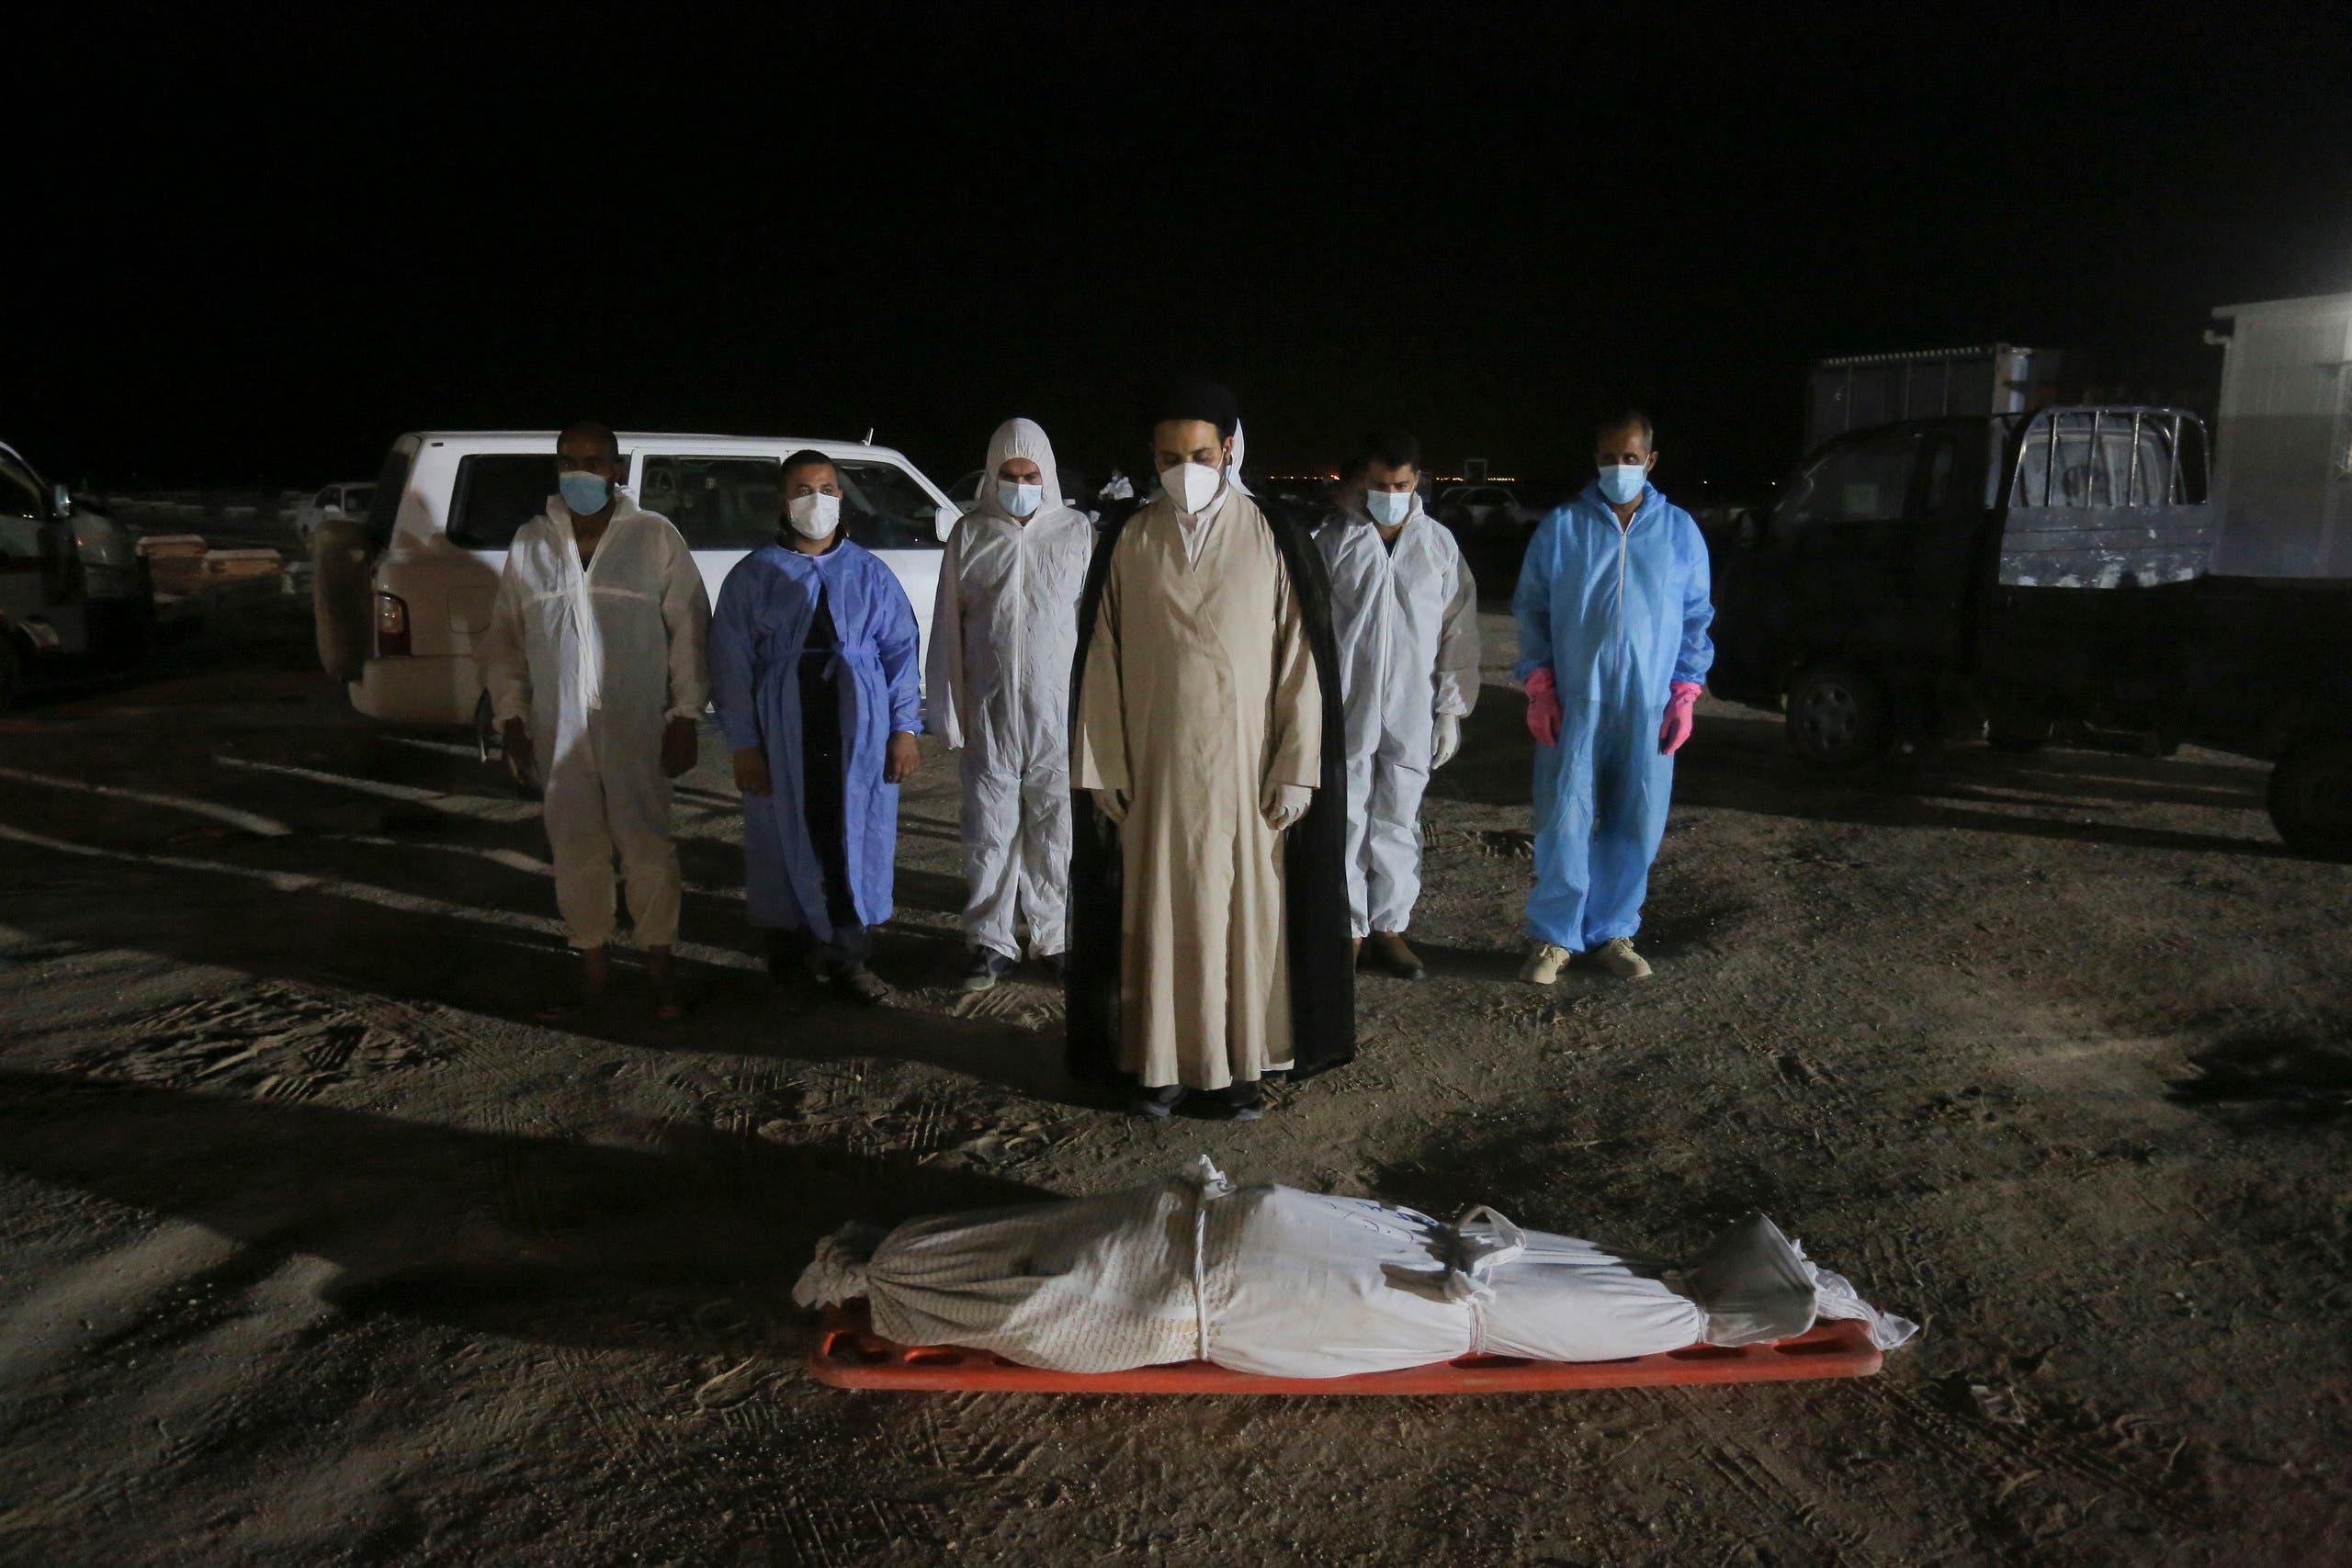 Shiite cleric prays by the body of coronavirus victim at Wadi al-Salam cemetery near Najaf, Iraq, Sunday, July 19, 2020. (AP)